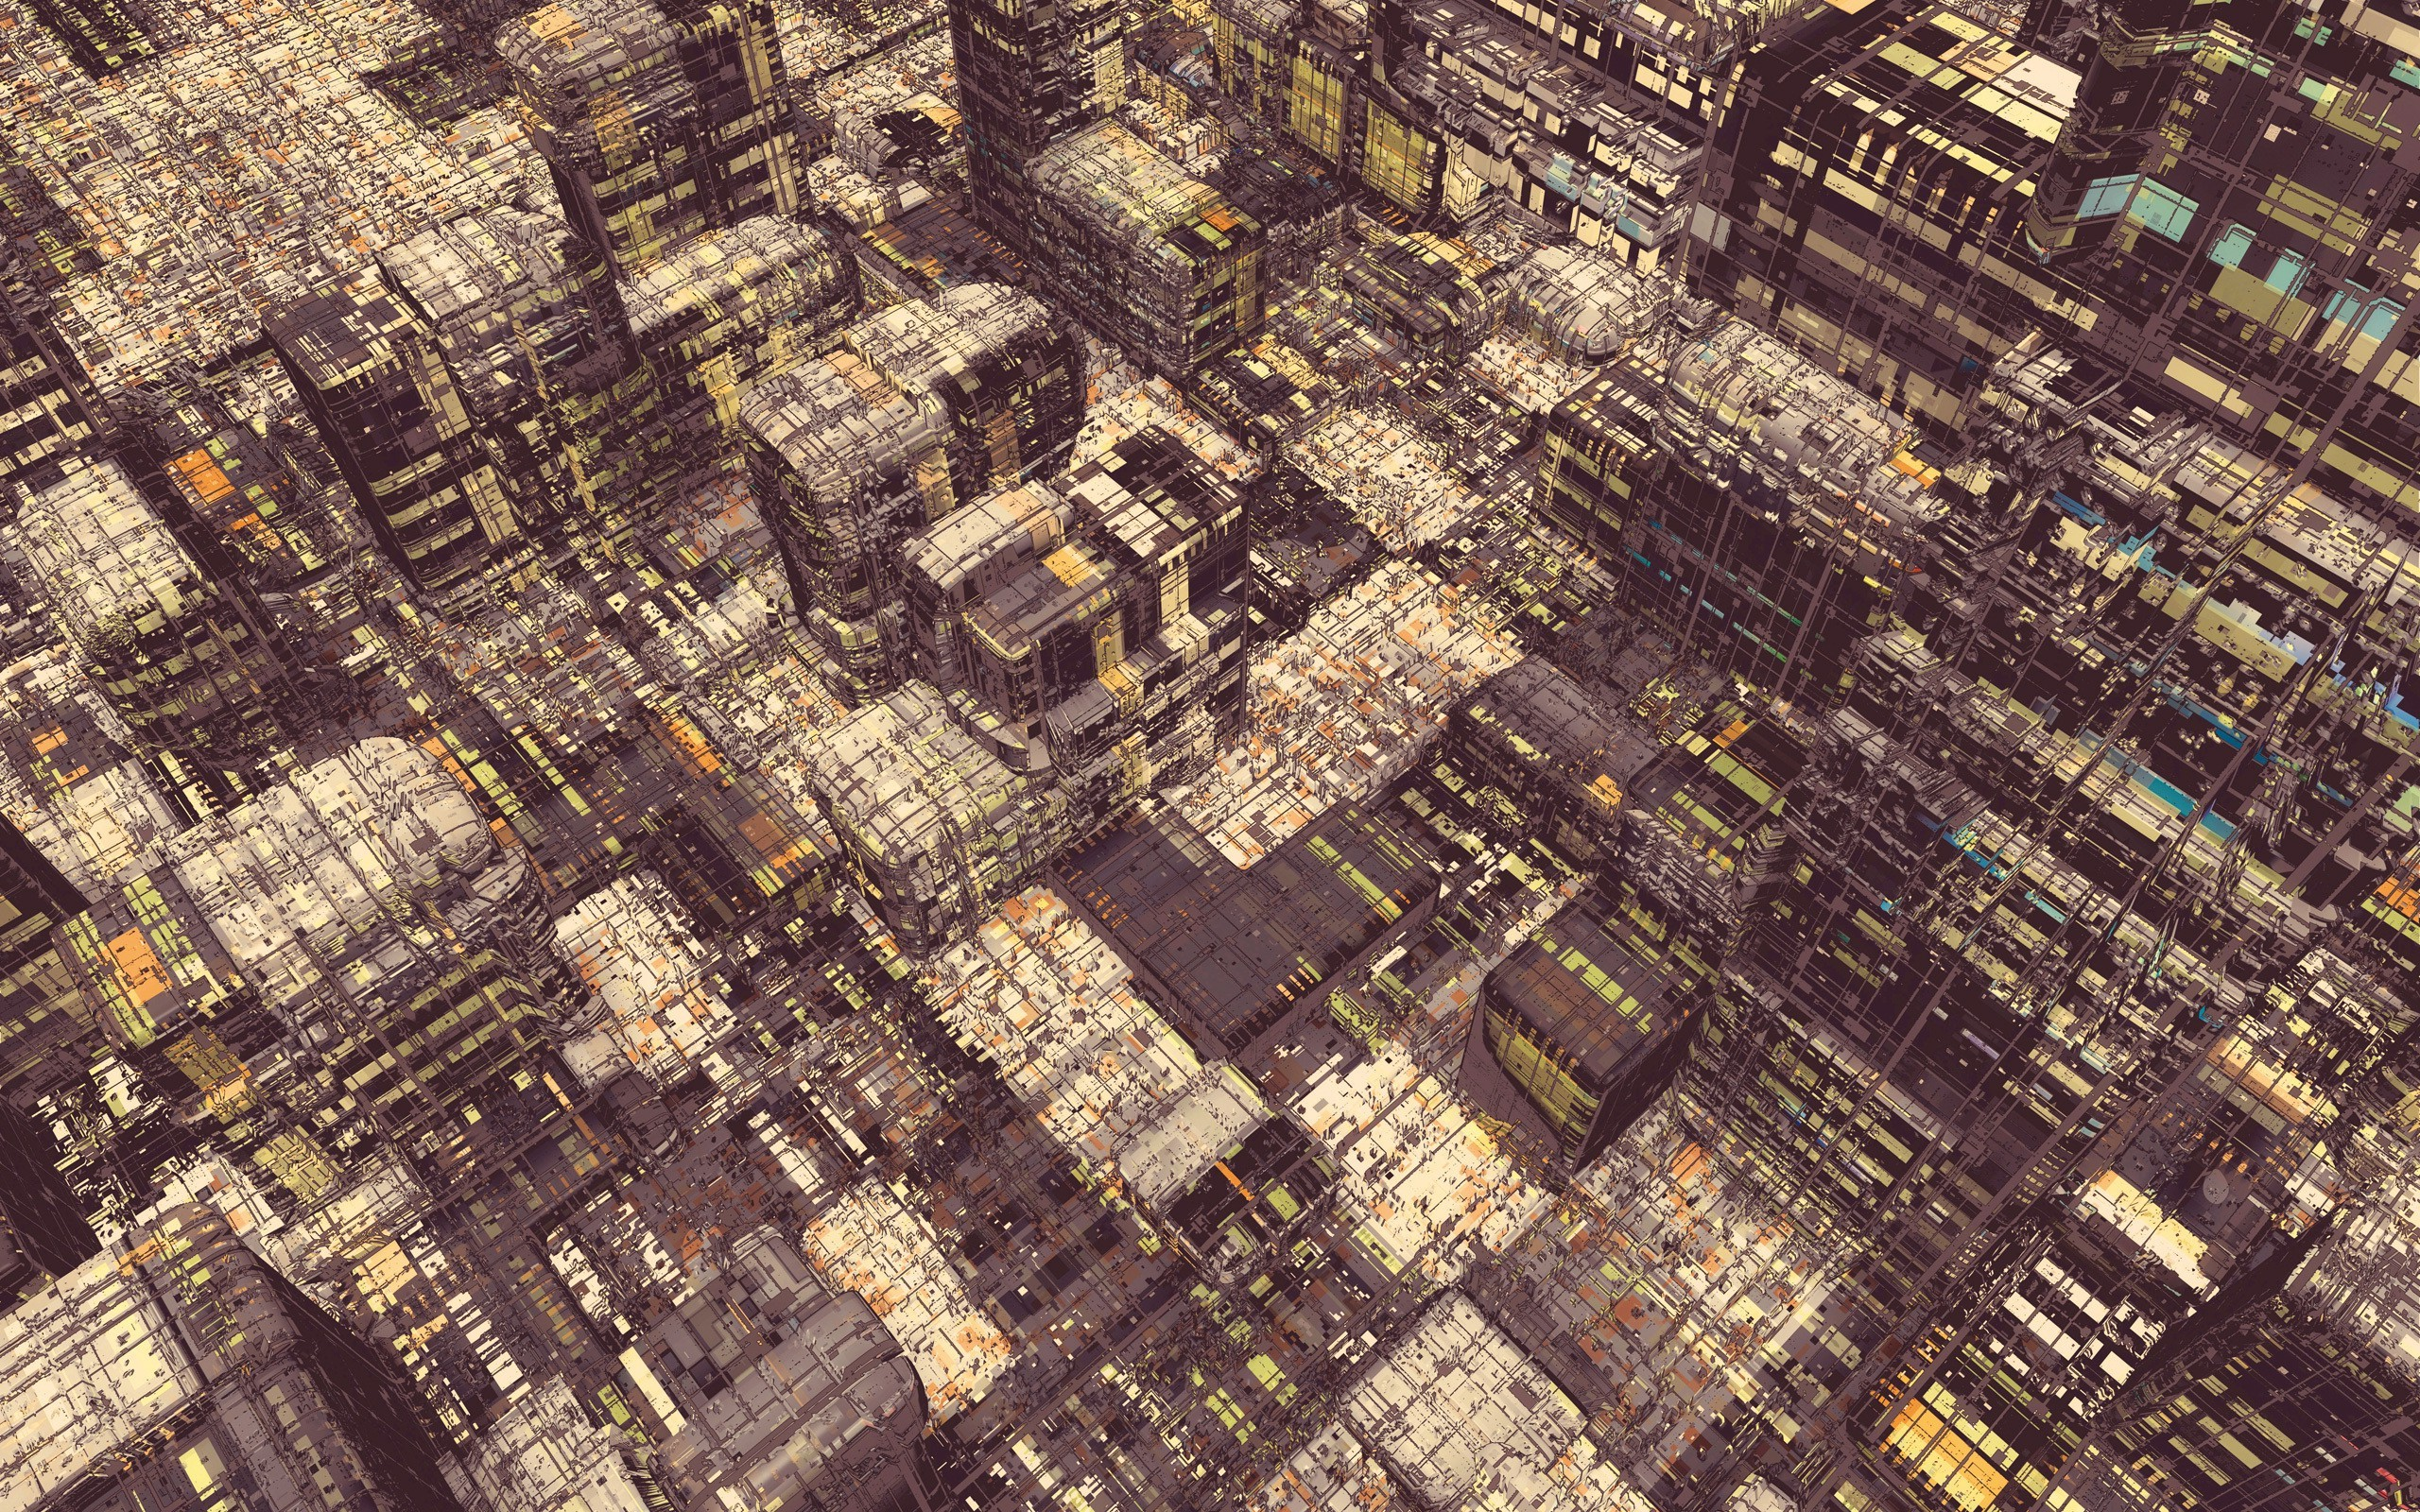 architecture Digital Art Cityscape Artwork Atelier Olschinsky 2560x1600